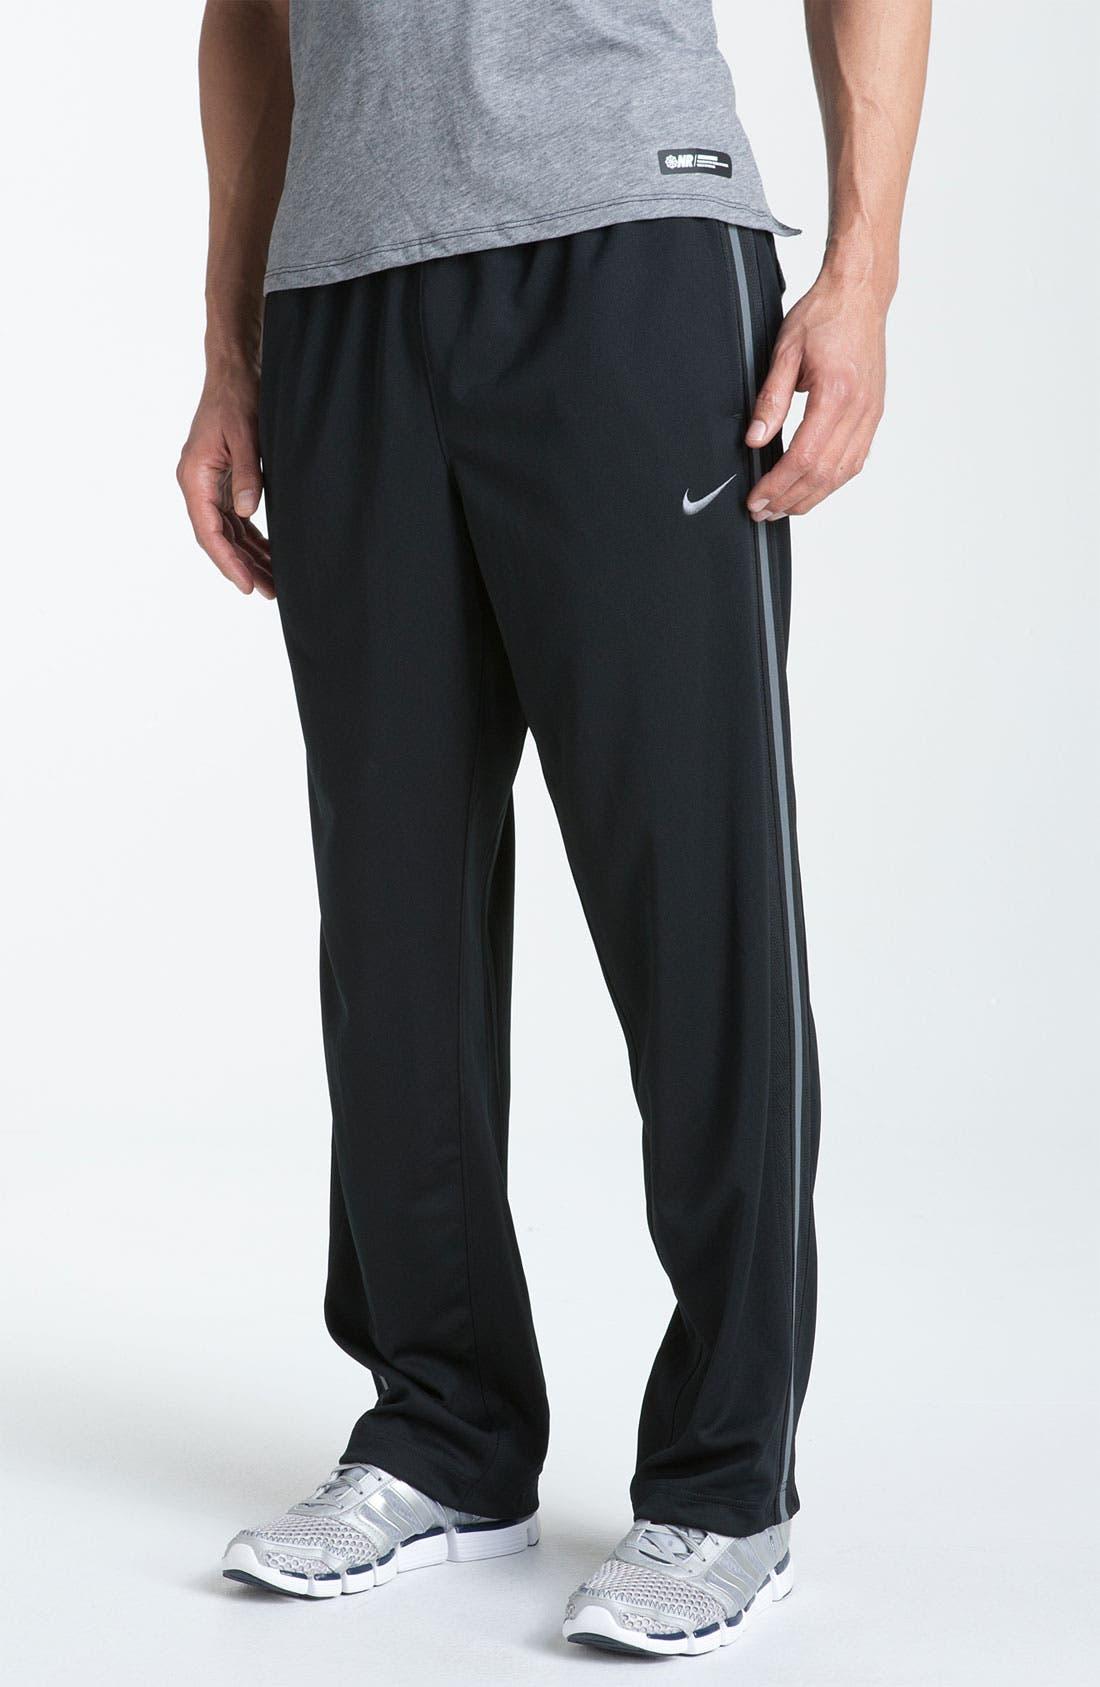 Alternate Image 1 Selected - Nike 'Epic' Dri-FIT Training Pants